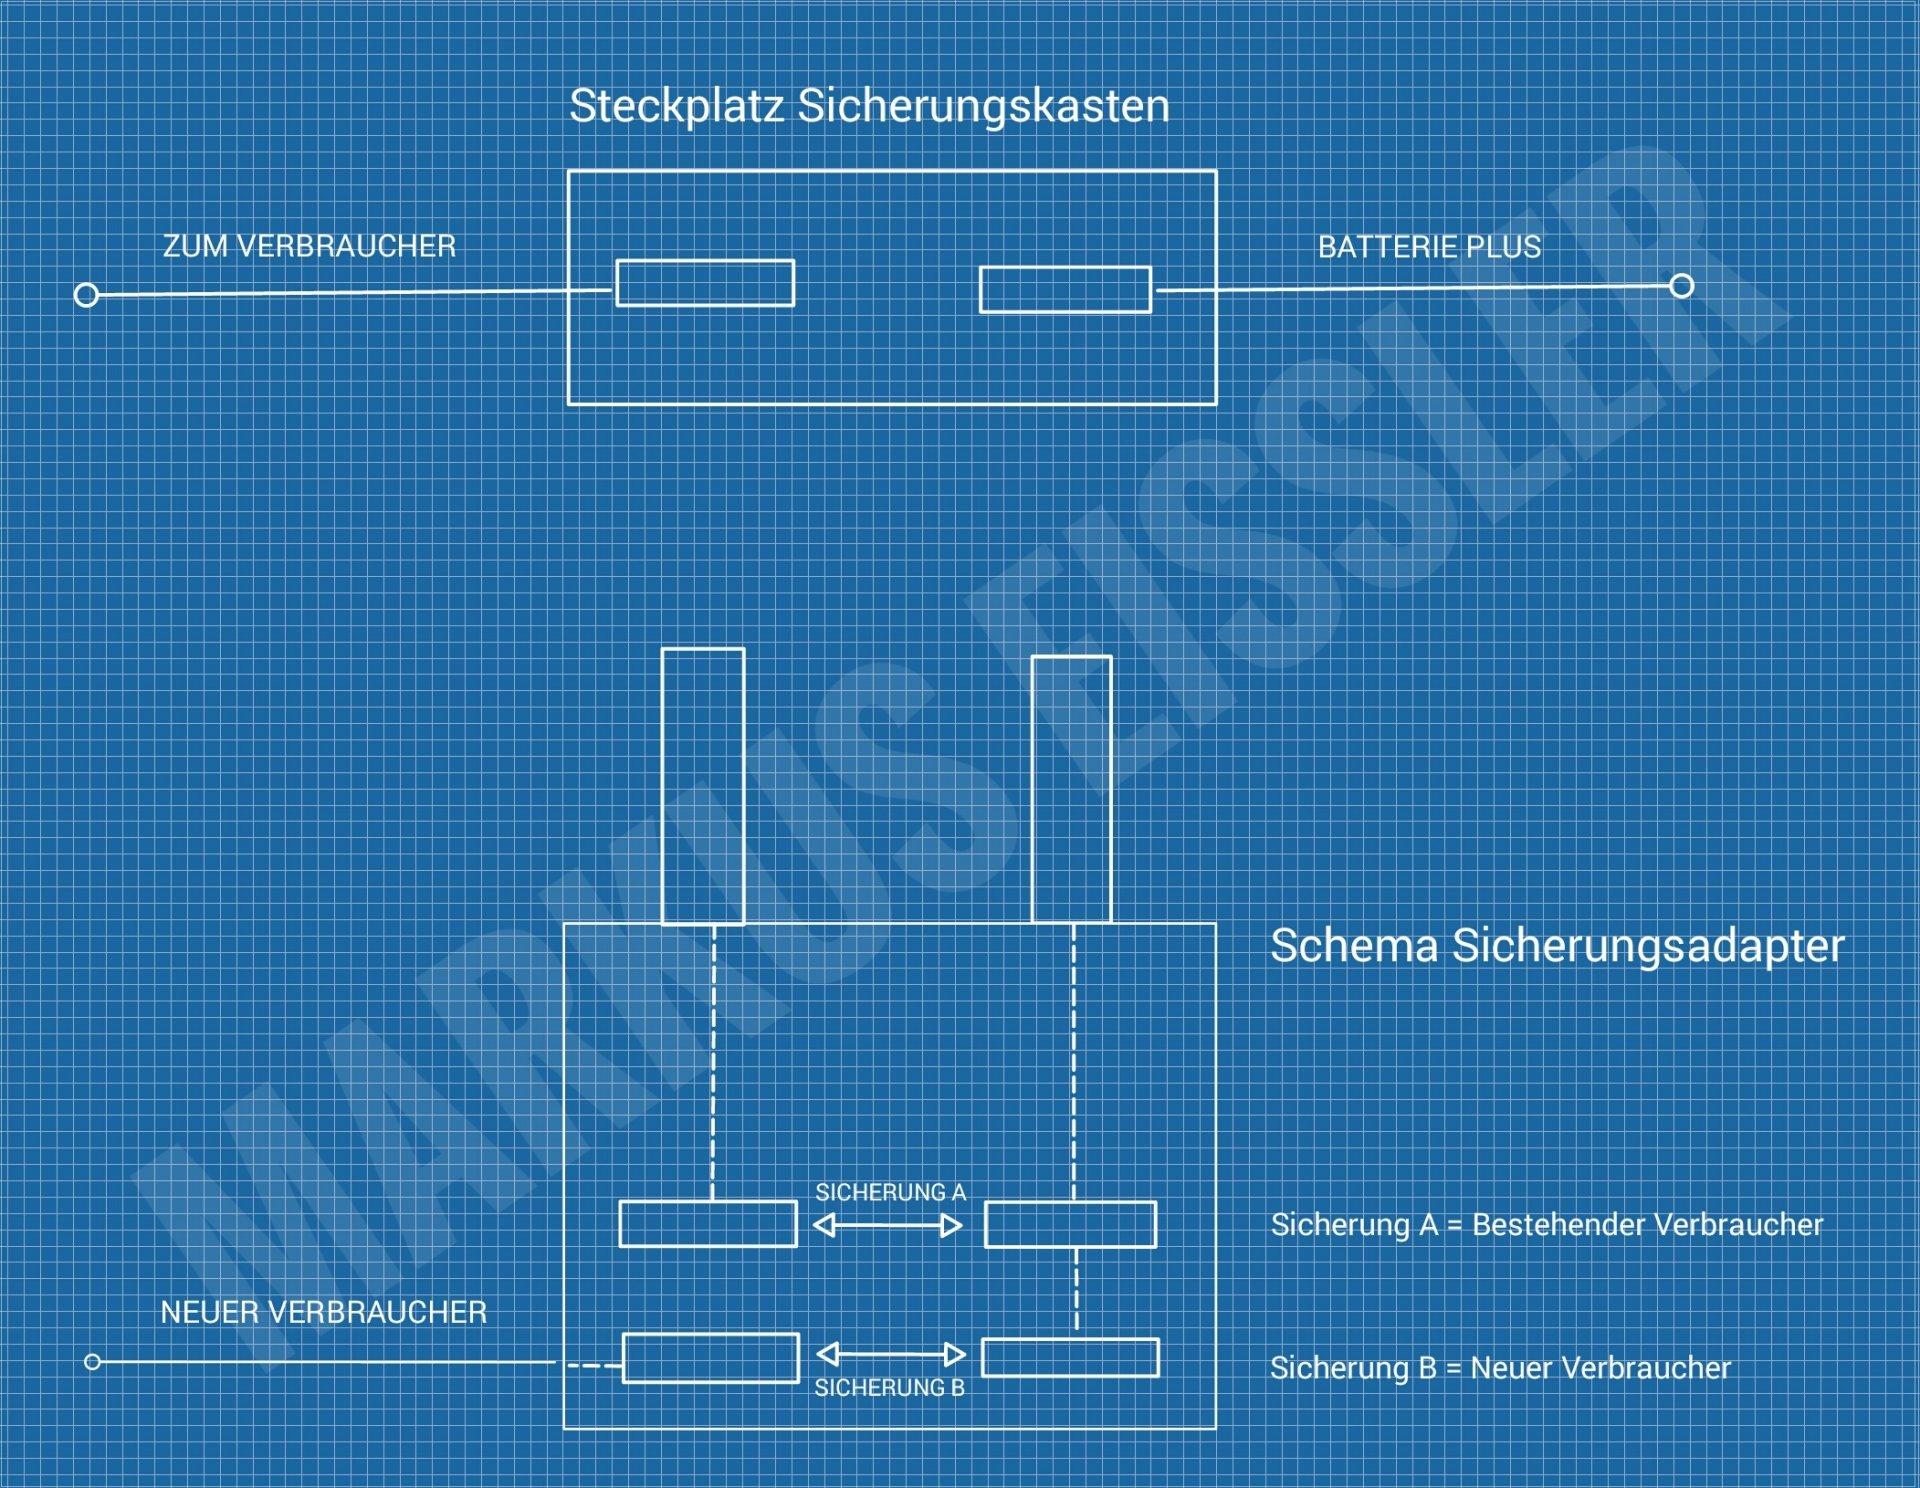 Avensis & Sicherungsadapter-01.jpg